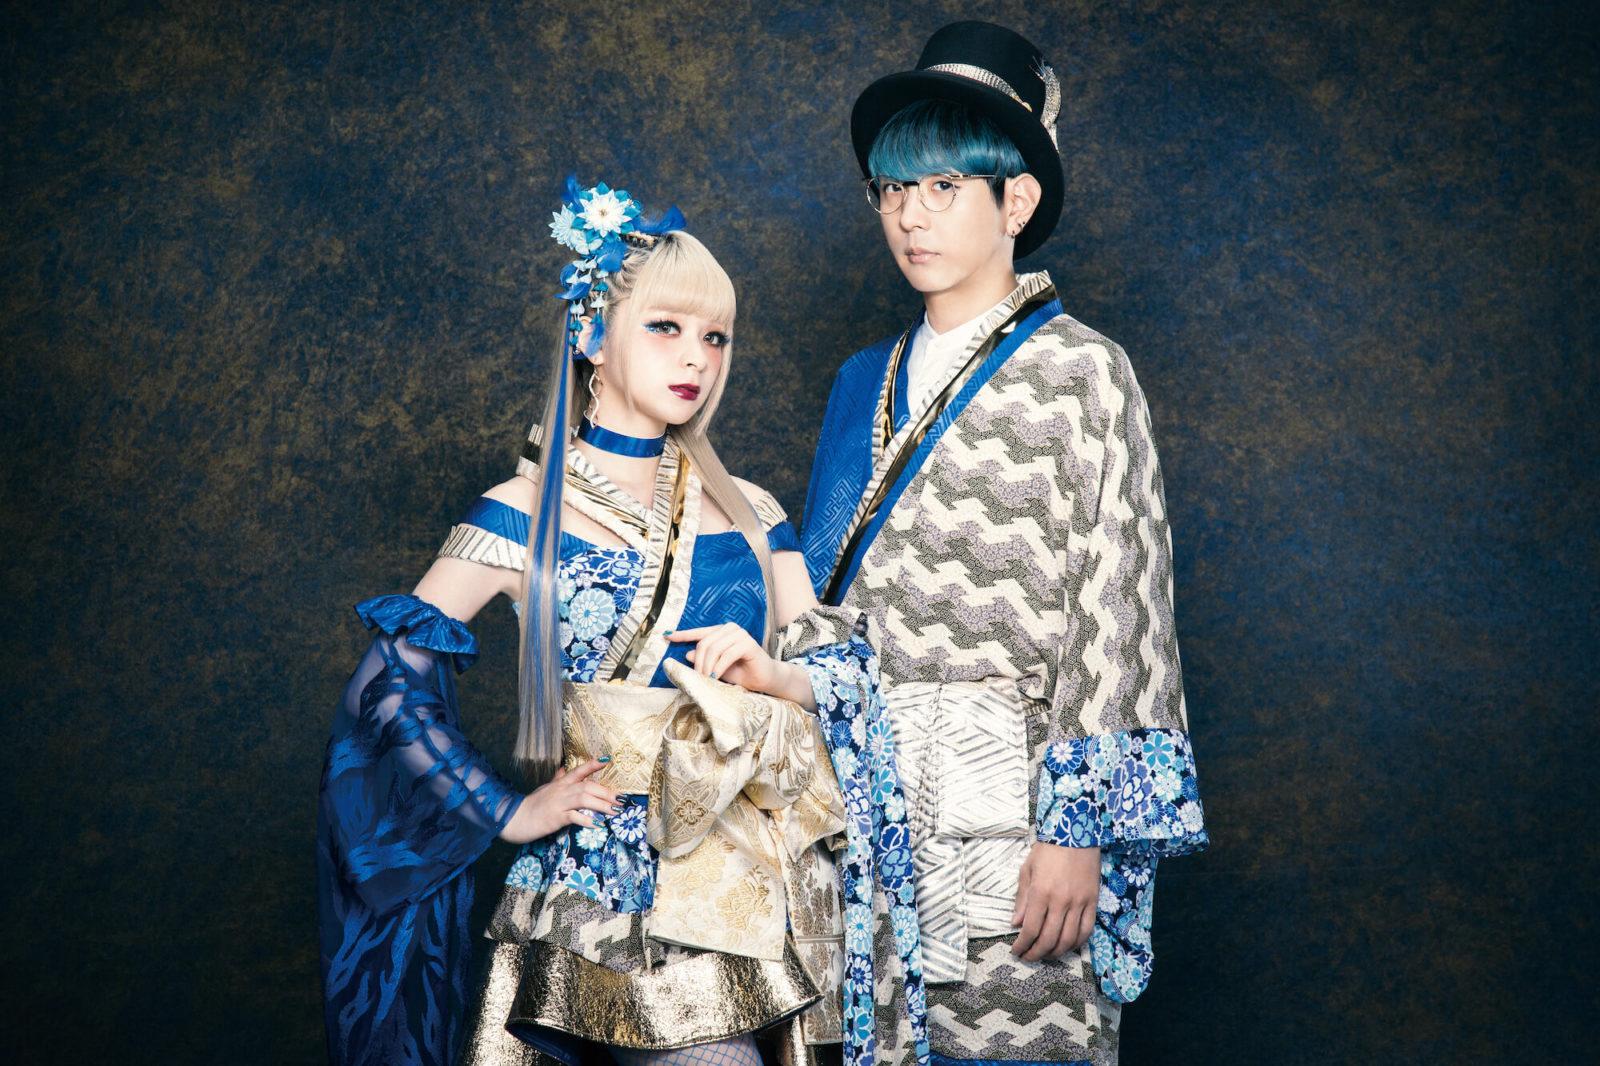 GARNiDELiA、10月5日開催の「Anime Rave Festival(アニレヴ)」に出演決定サムネイル画像